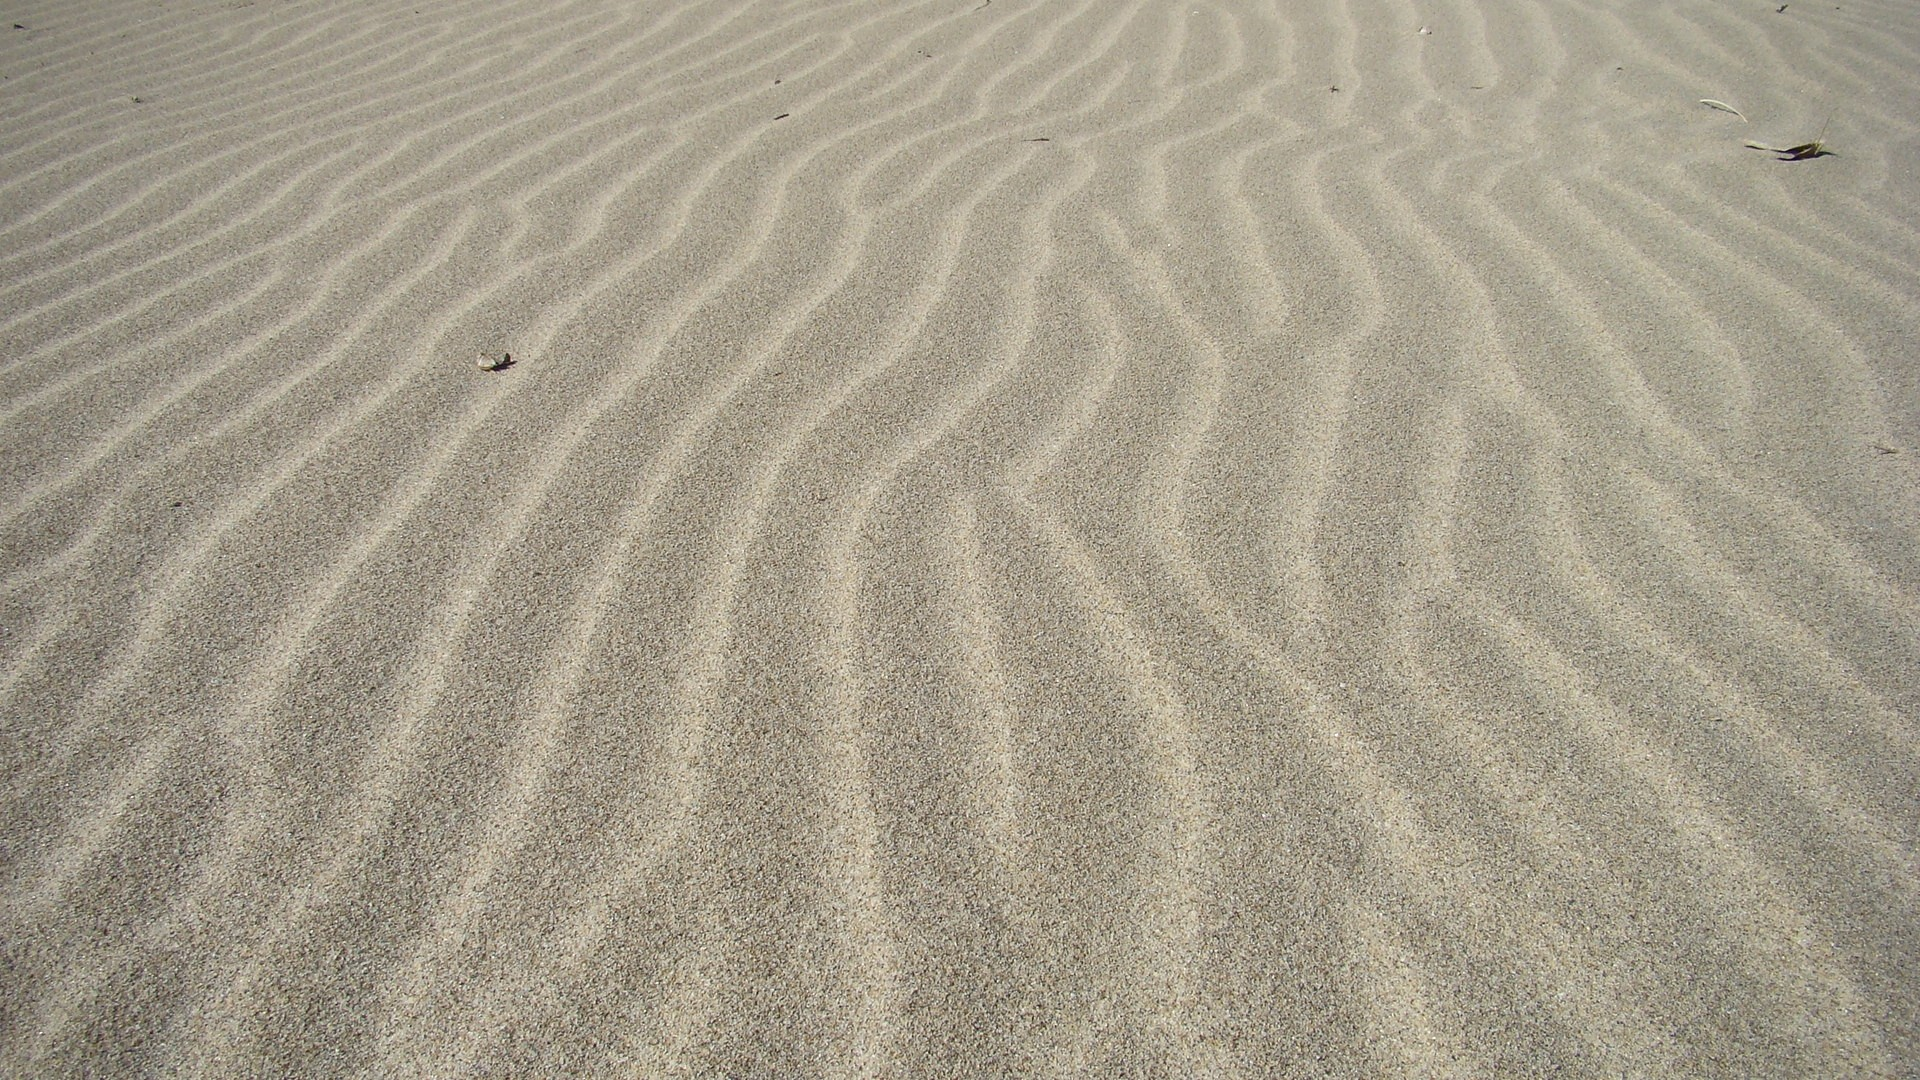 Sand desktop wallpaper hd